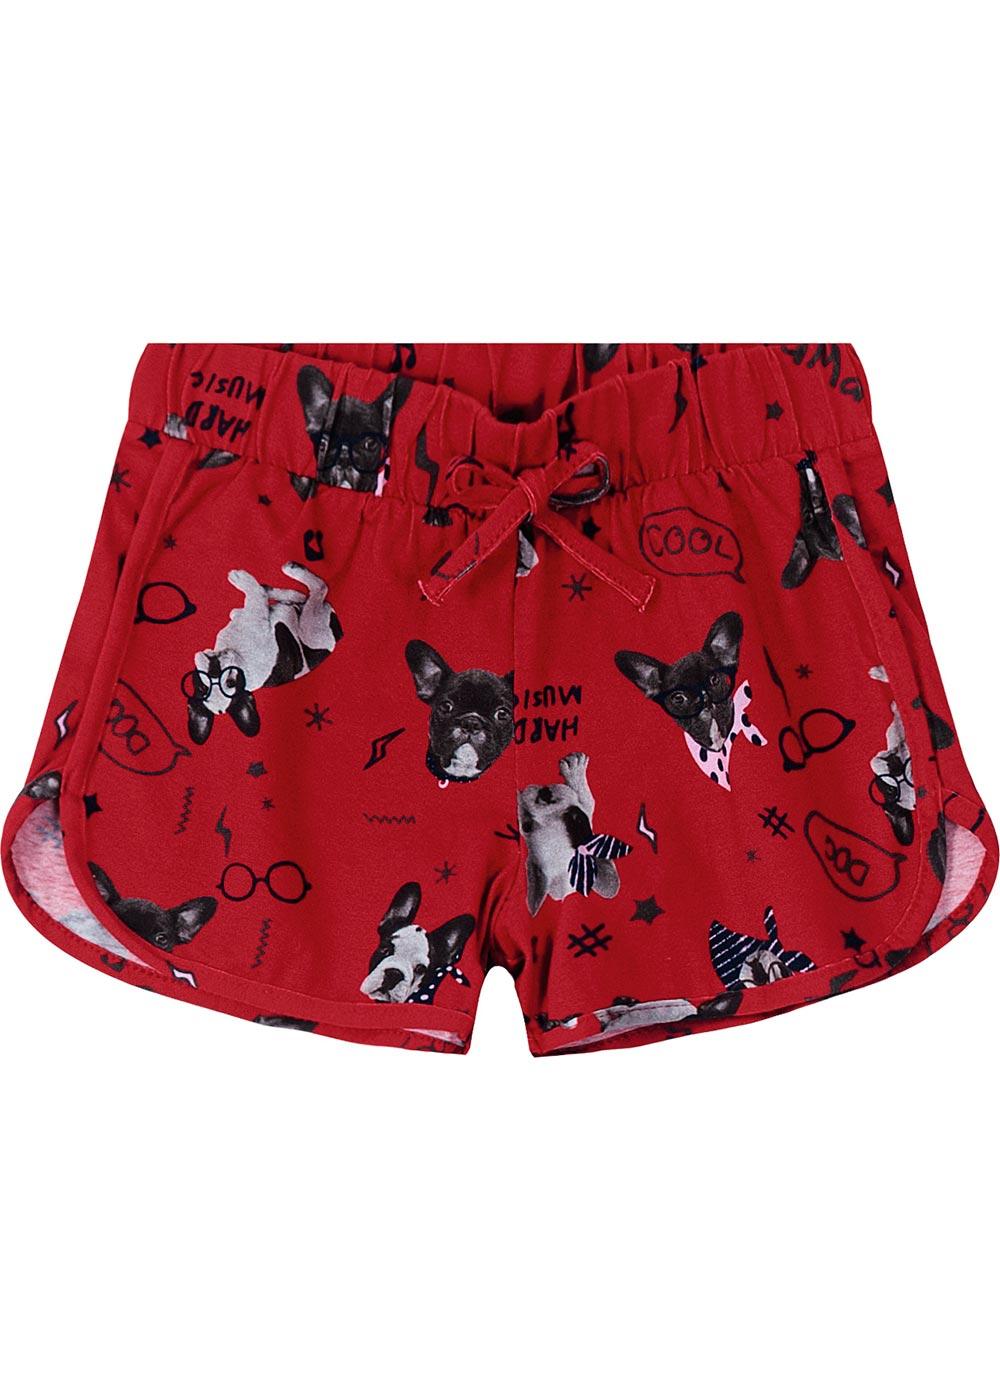 Shorts Infantil Feminino Vermelho Dog Frenchies - Malwee